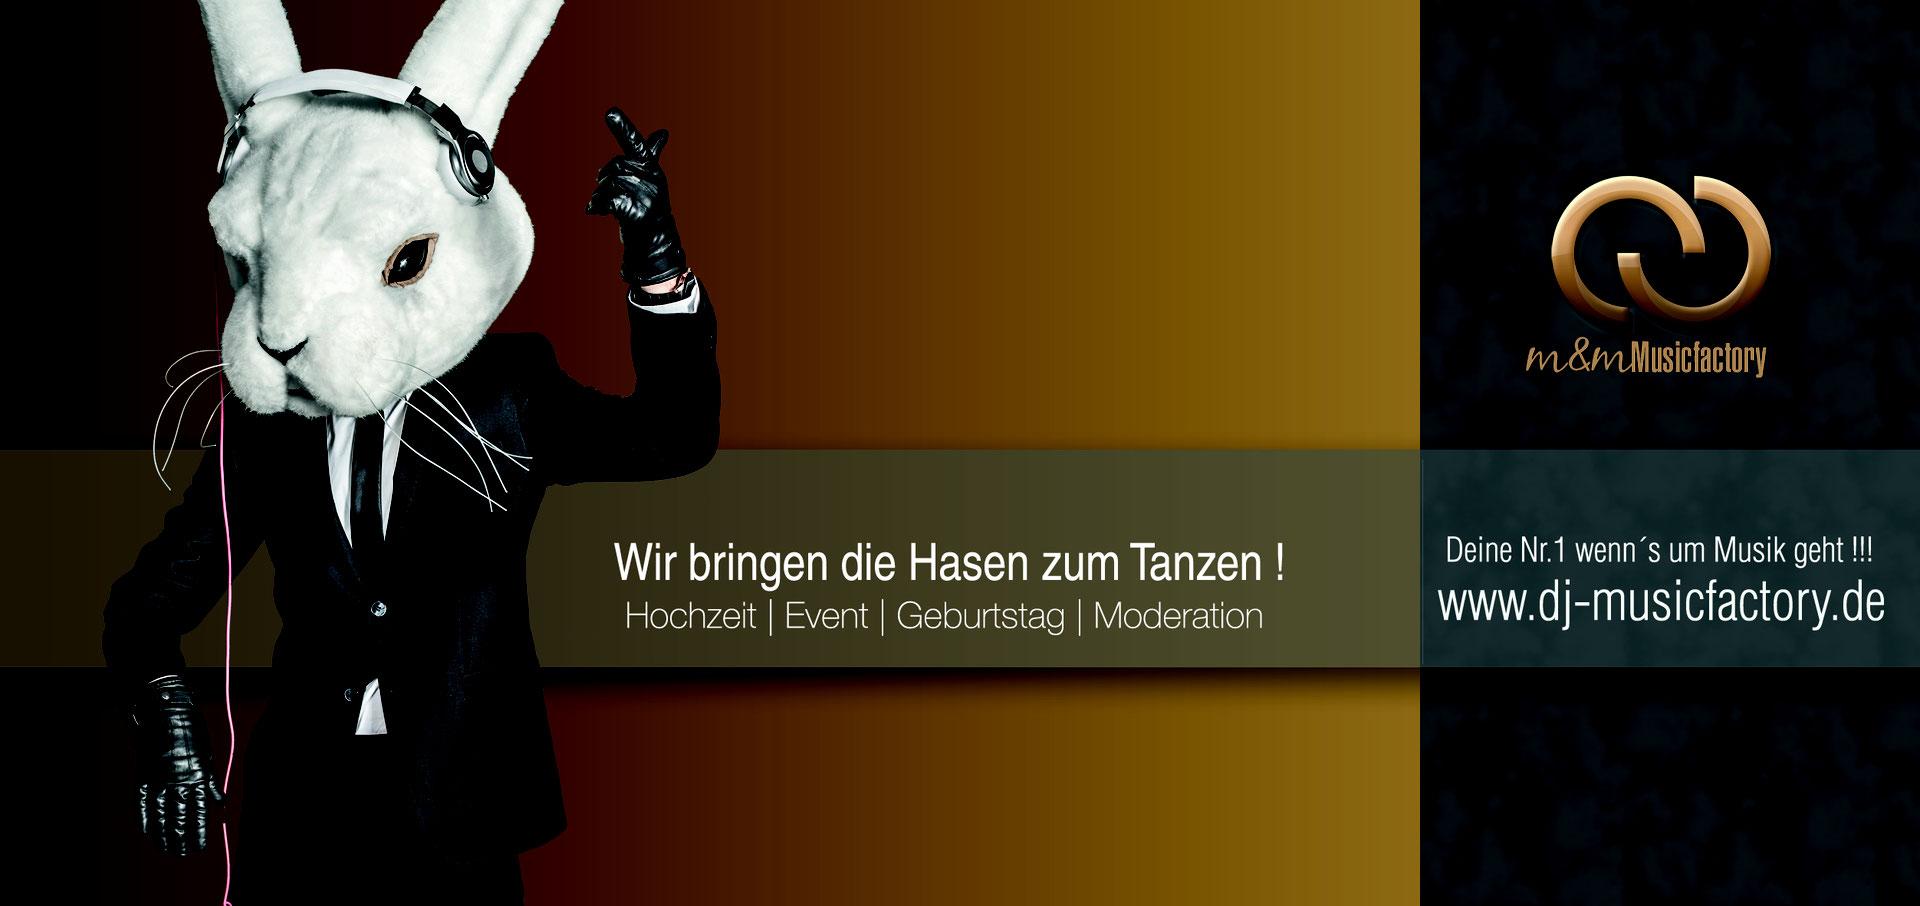 (c) Dj-musicfactory.de